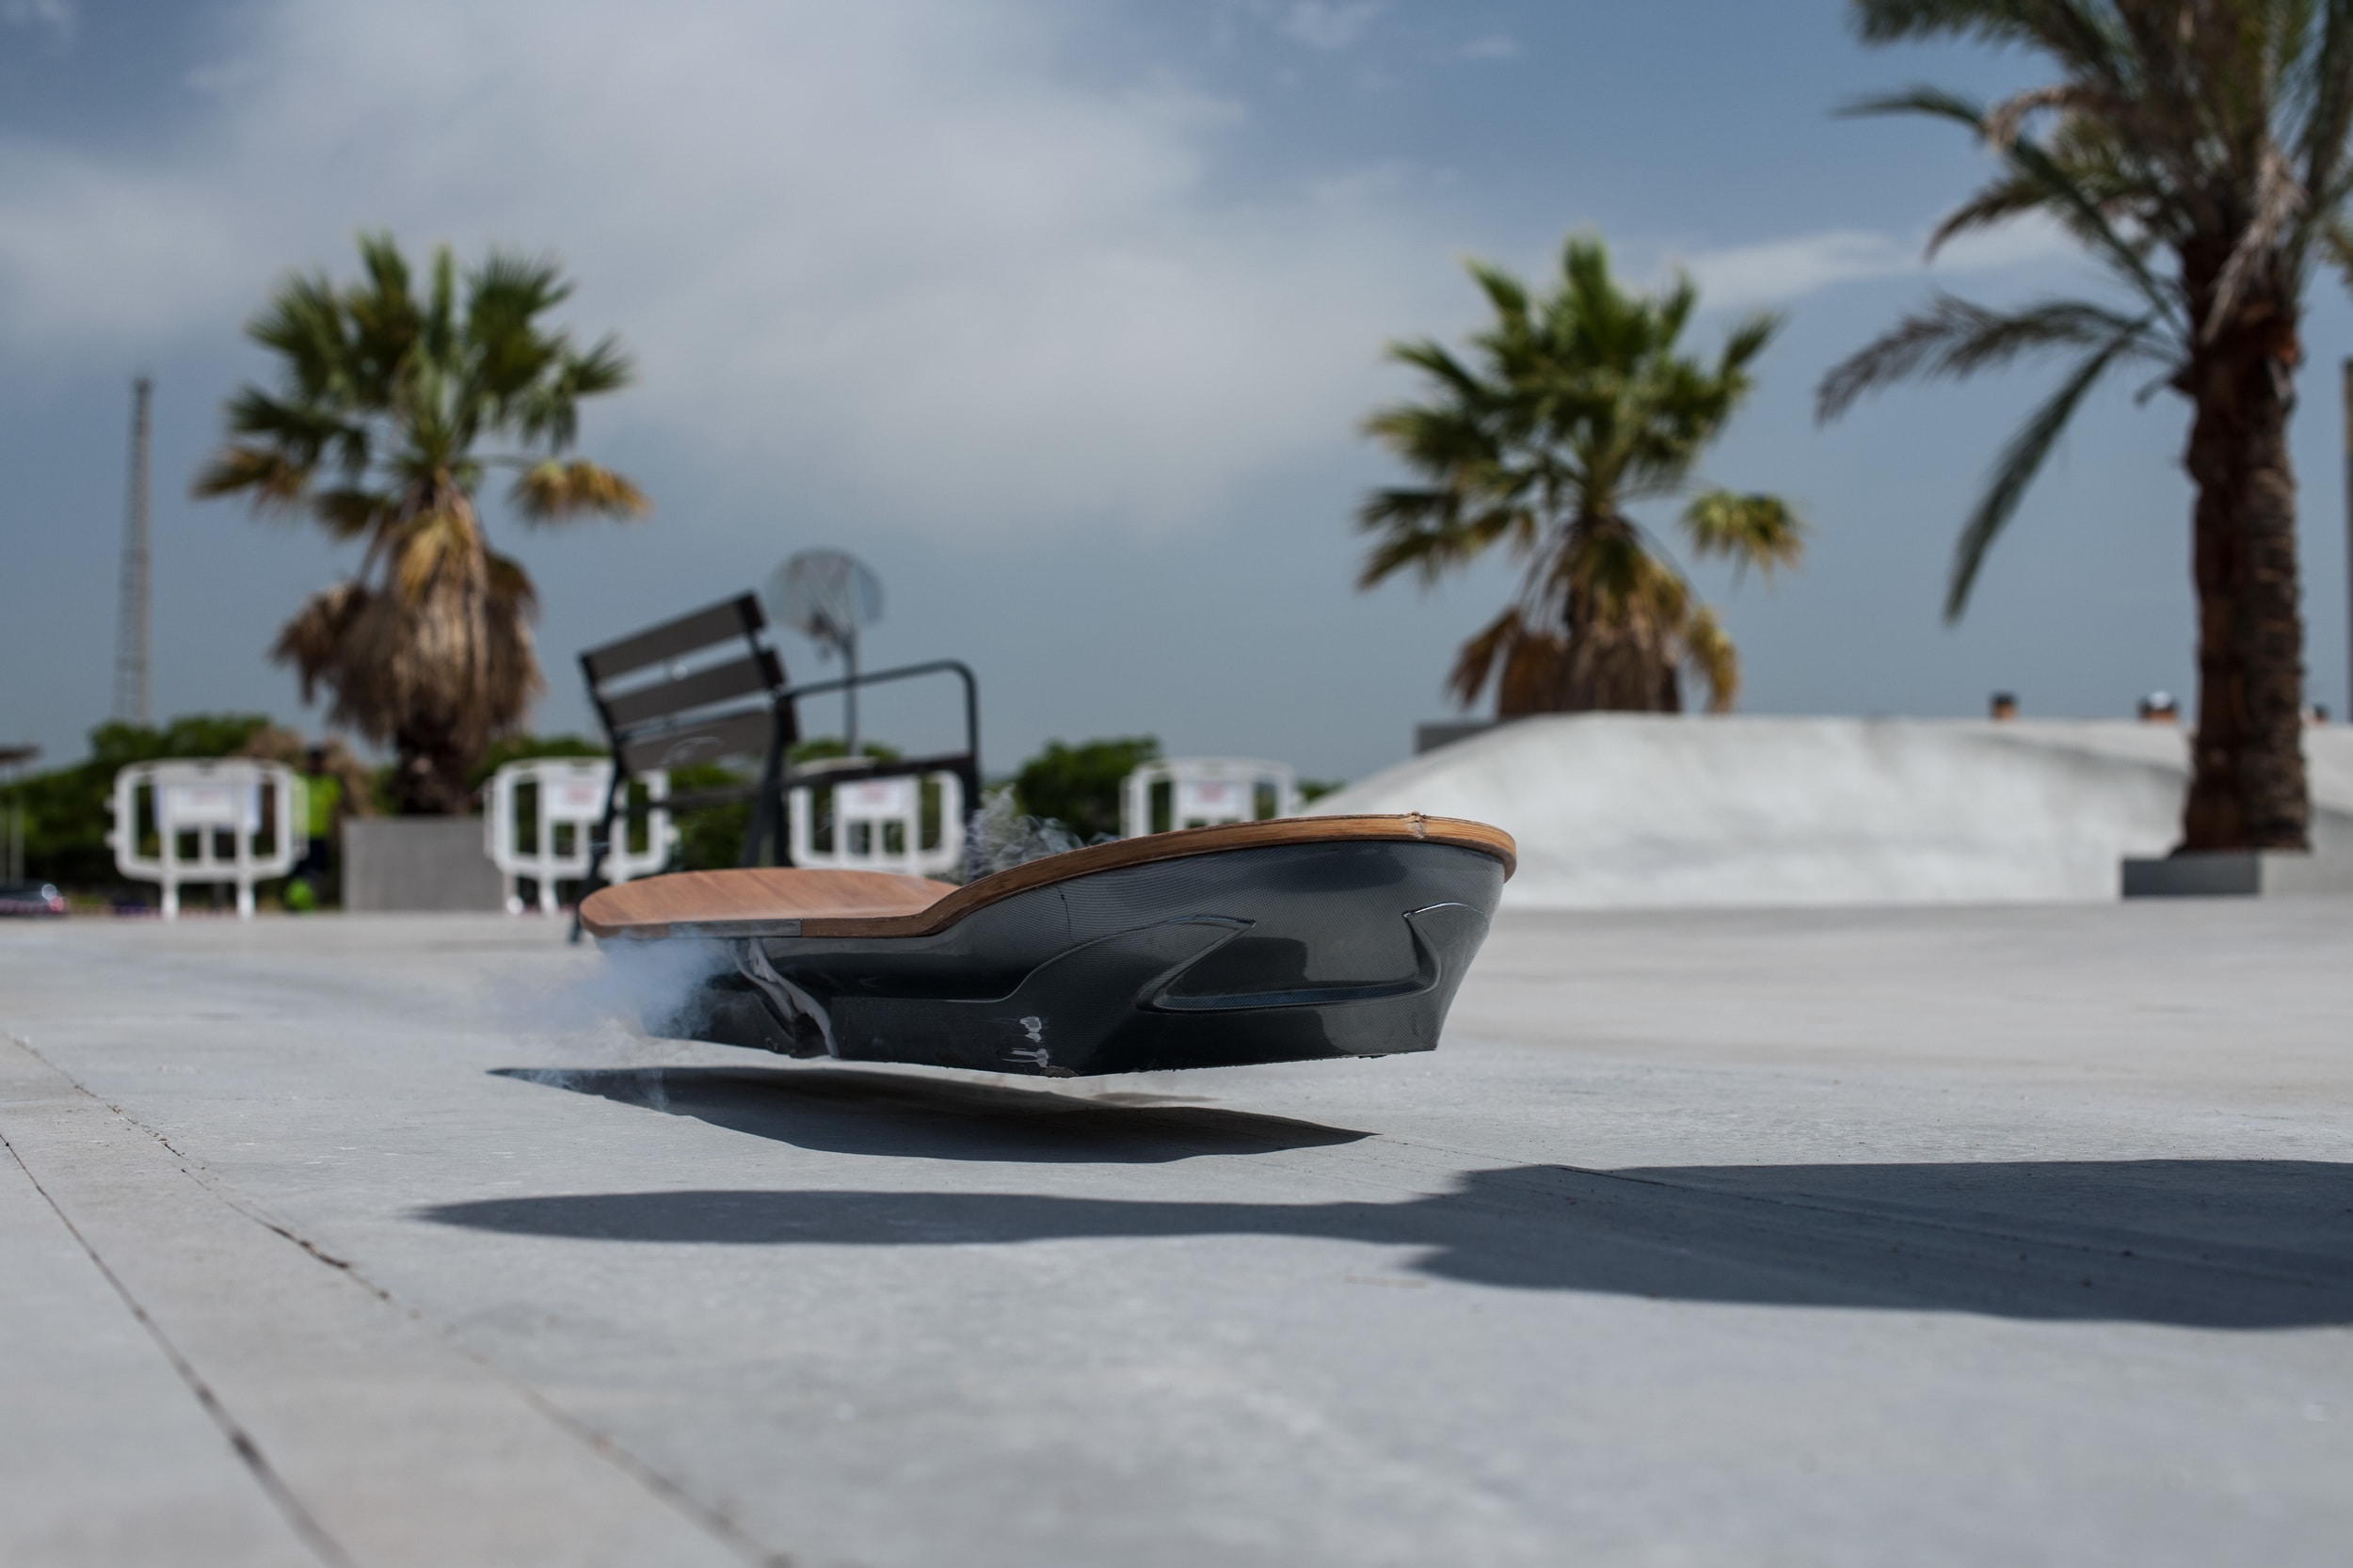 lexus slide hoverboard volopattino_1